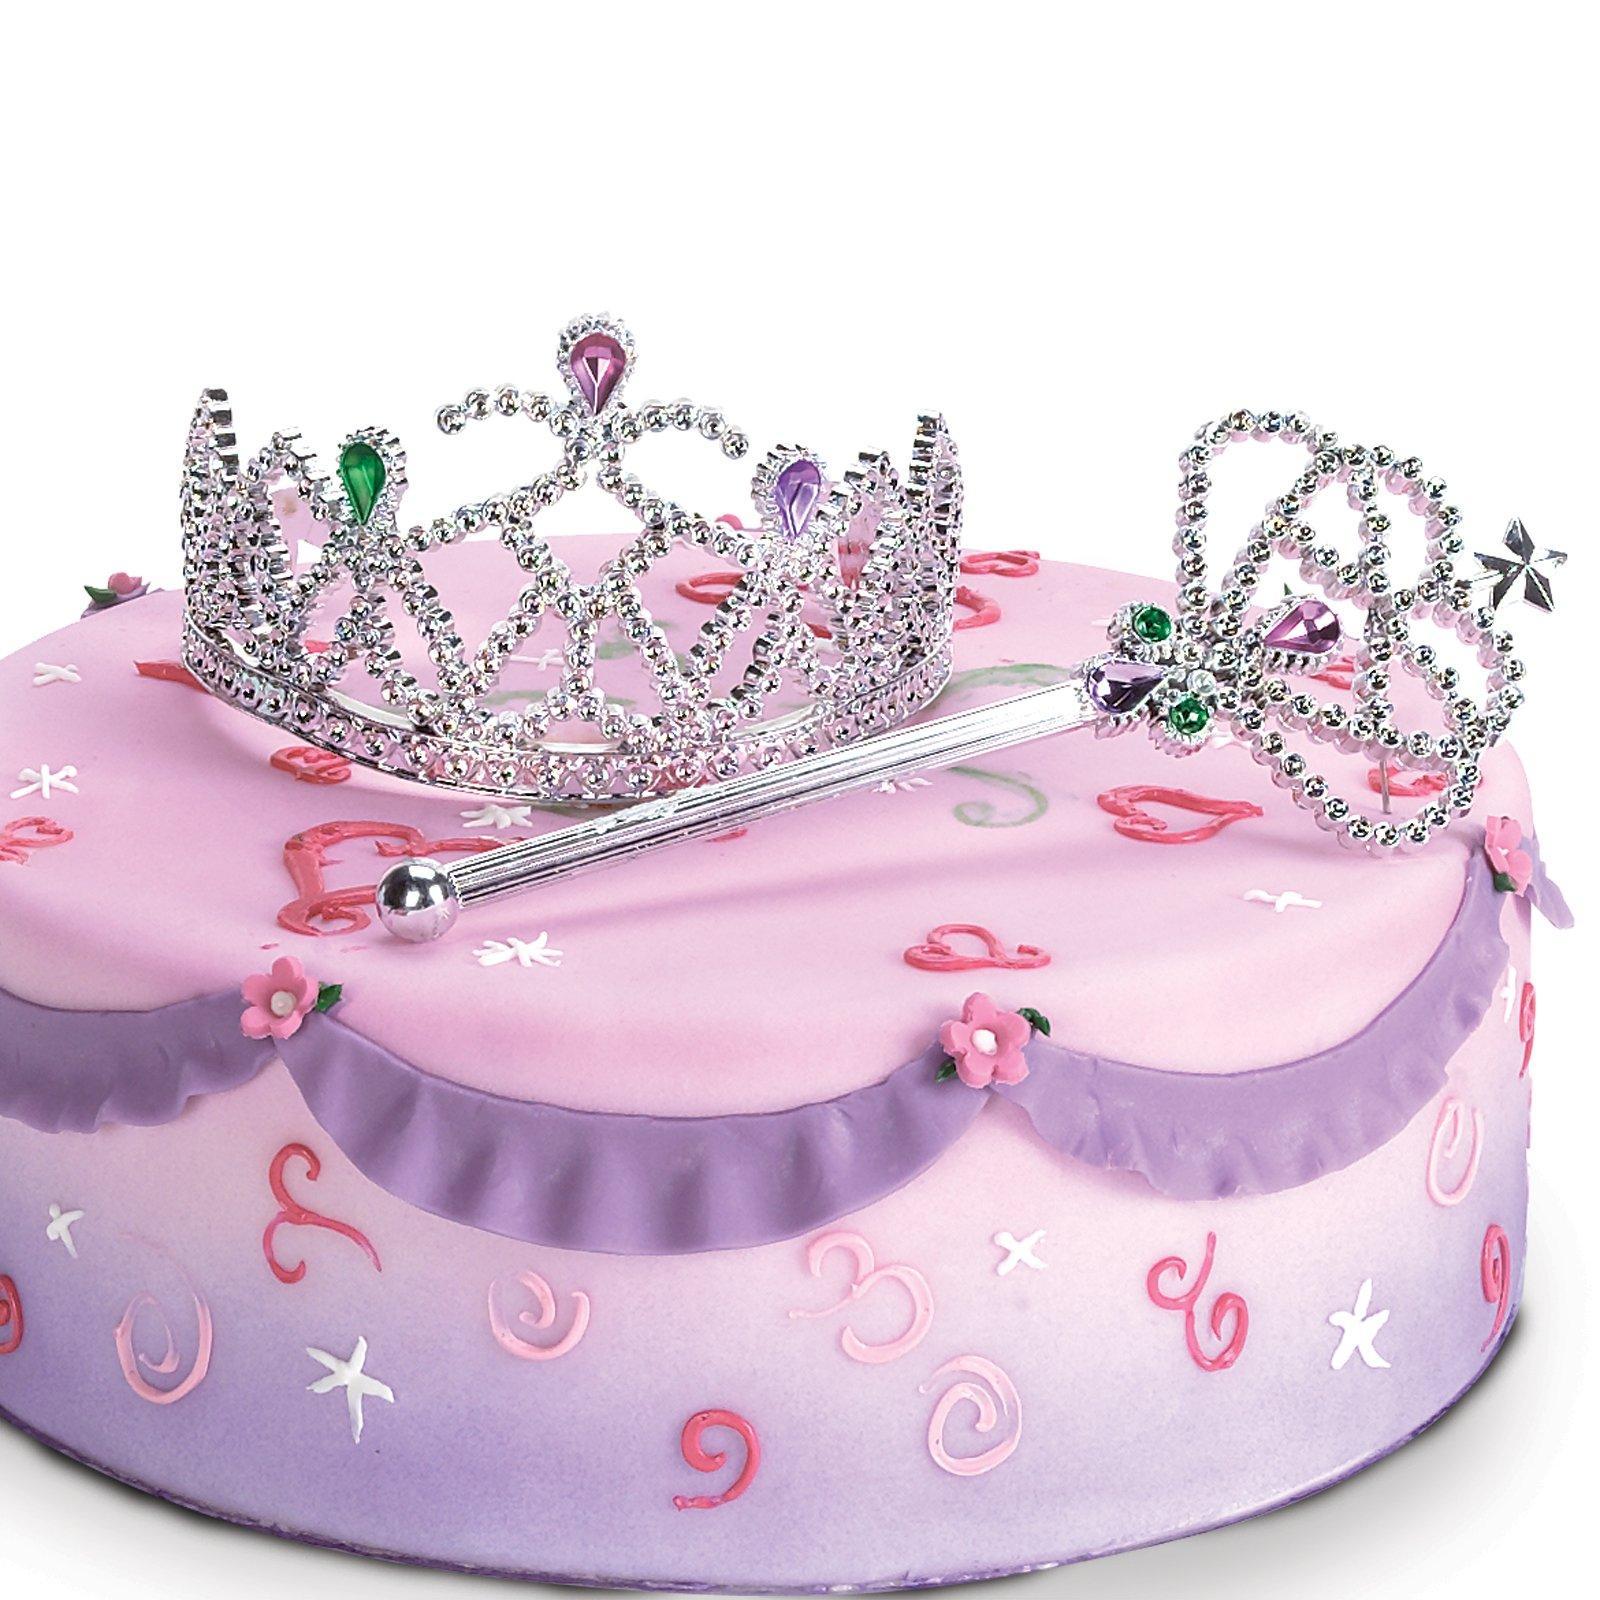 Princess Cake Toppers 2 Pieces BirthdayExpresscom